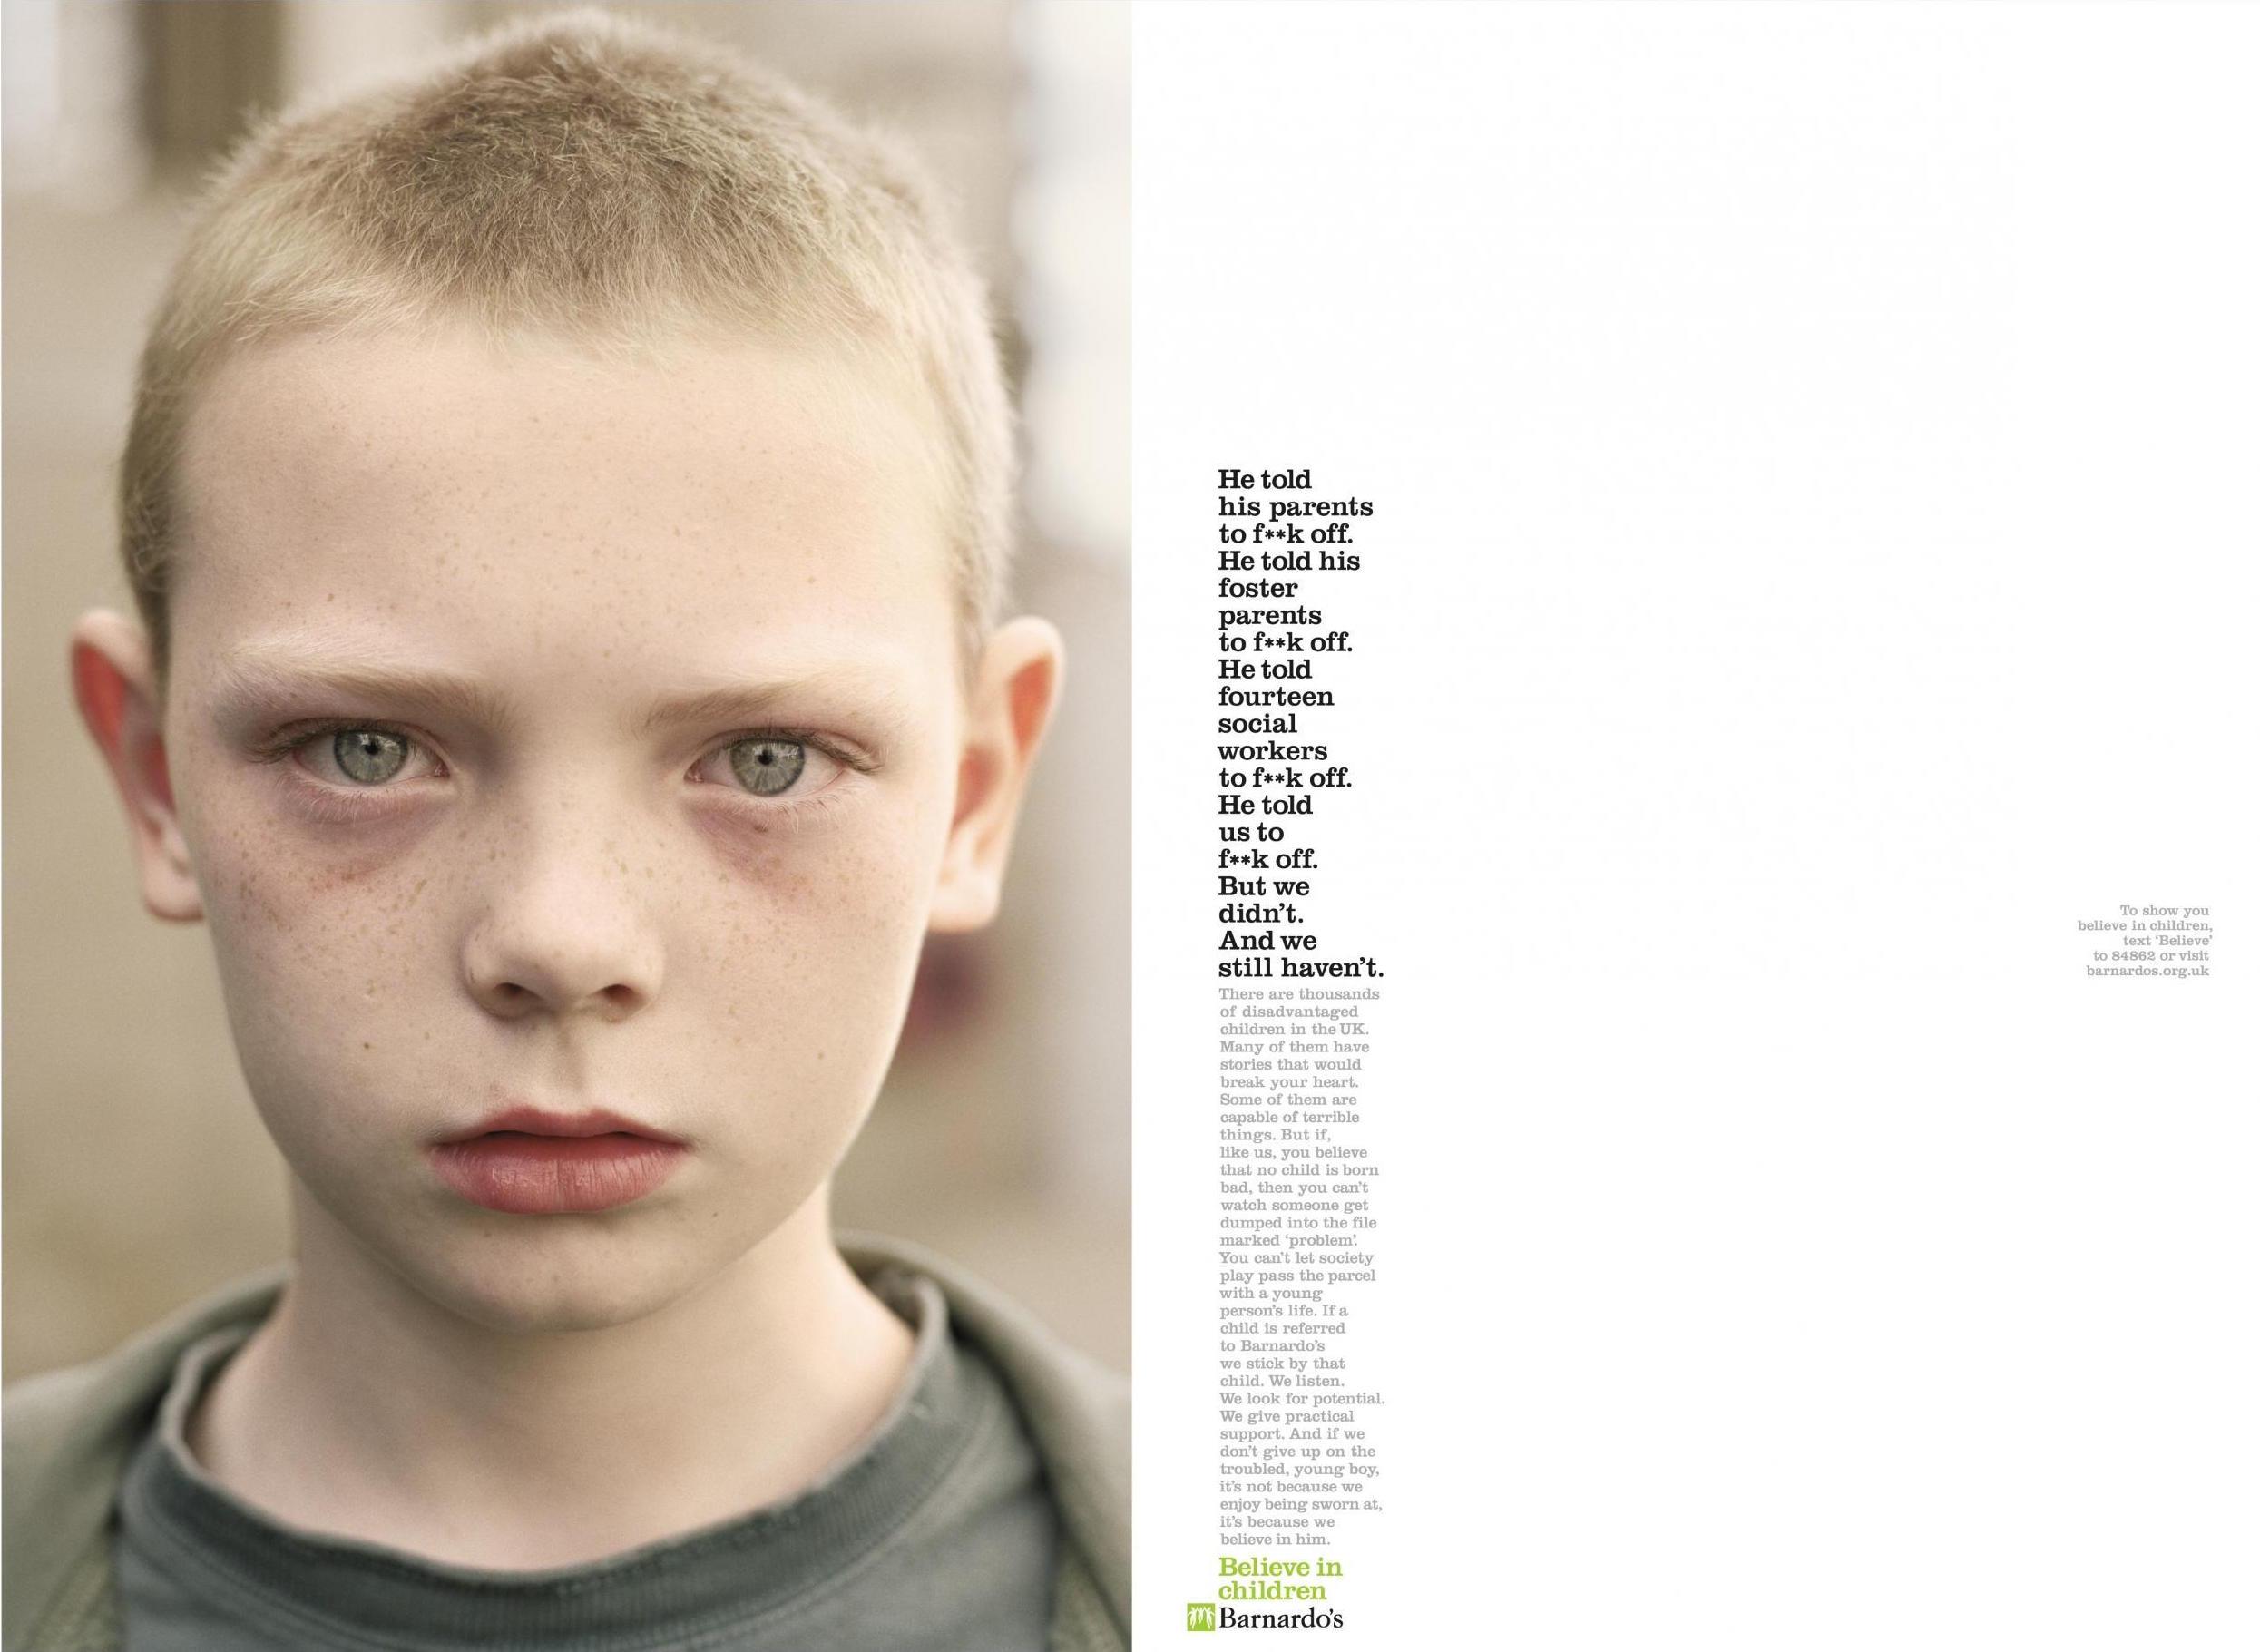 barnardos-childrens-charity-drowning-fk-off-print-310550-adeevee